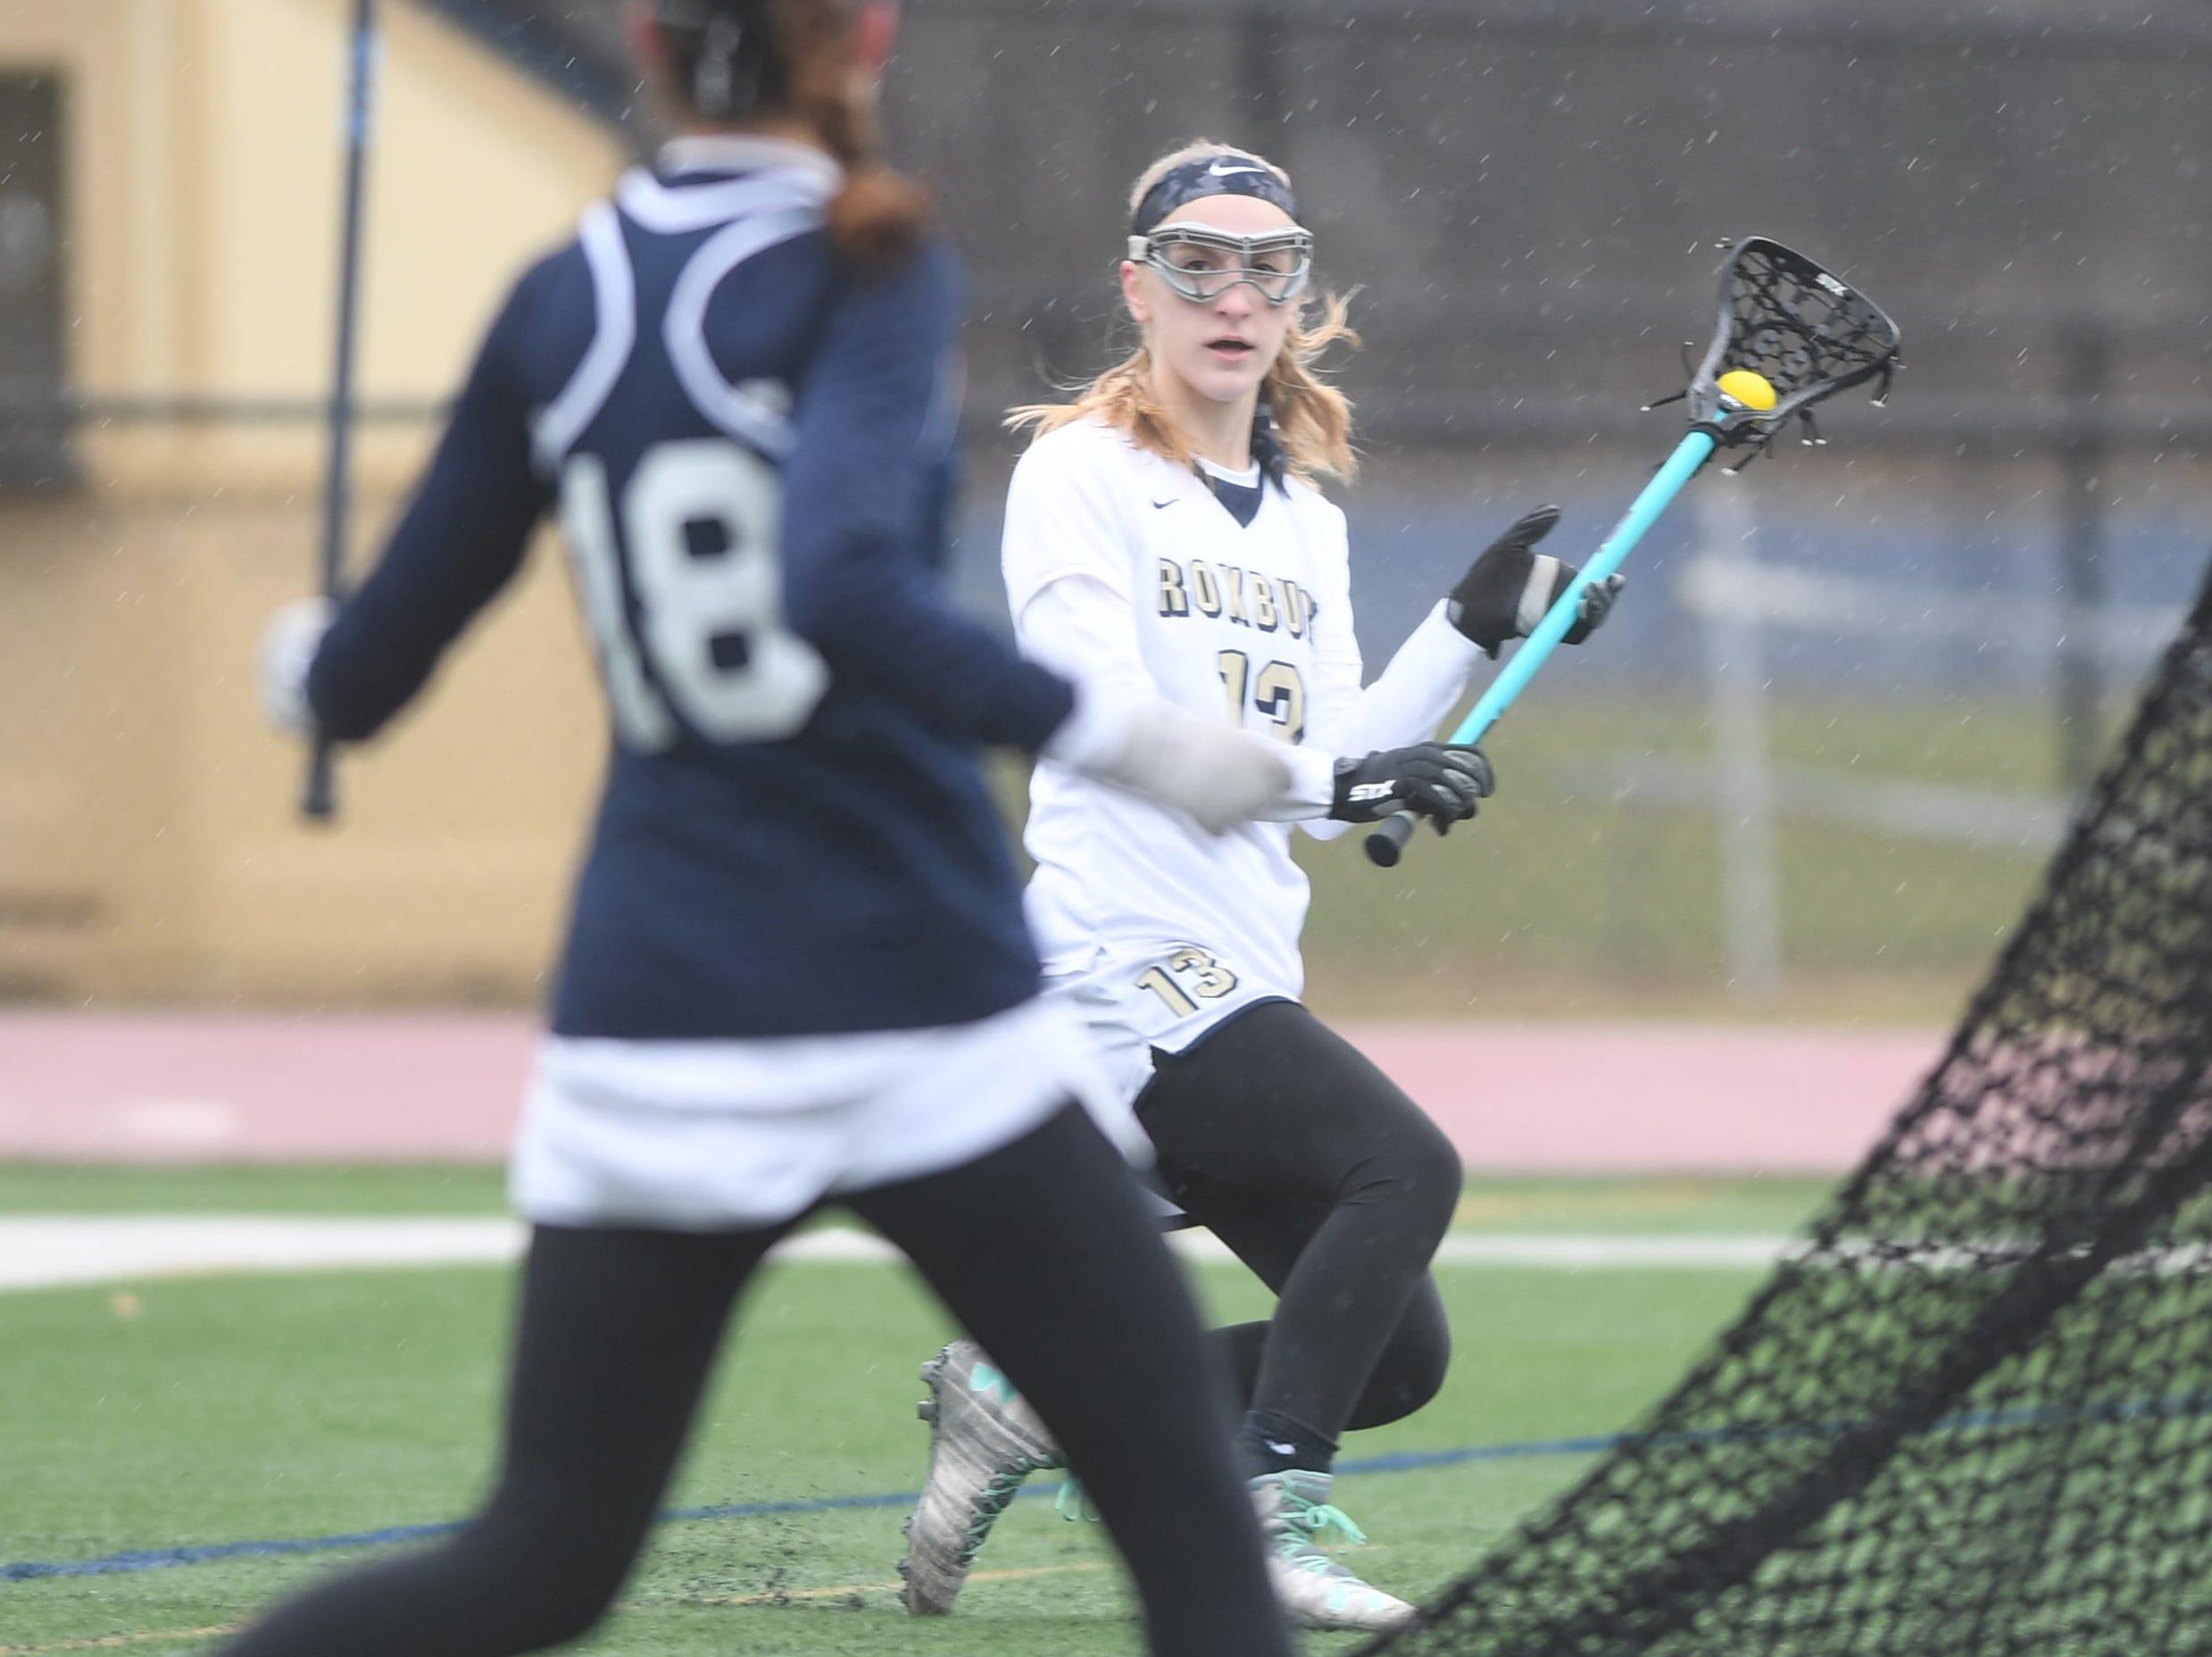 Randolph girls lacrosse at Roxbury on Friday, April 5, 2019. Roxbury #13 Deanna Maugeri.